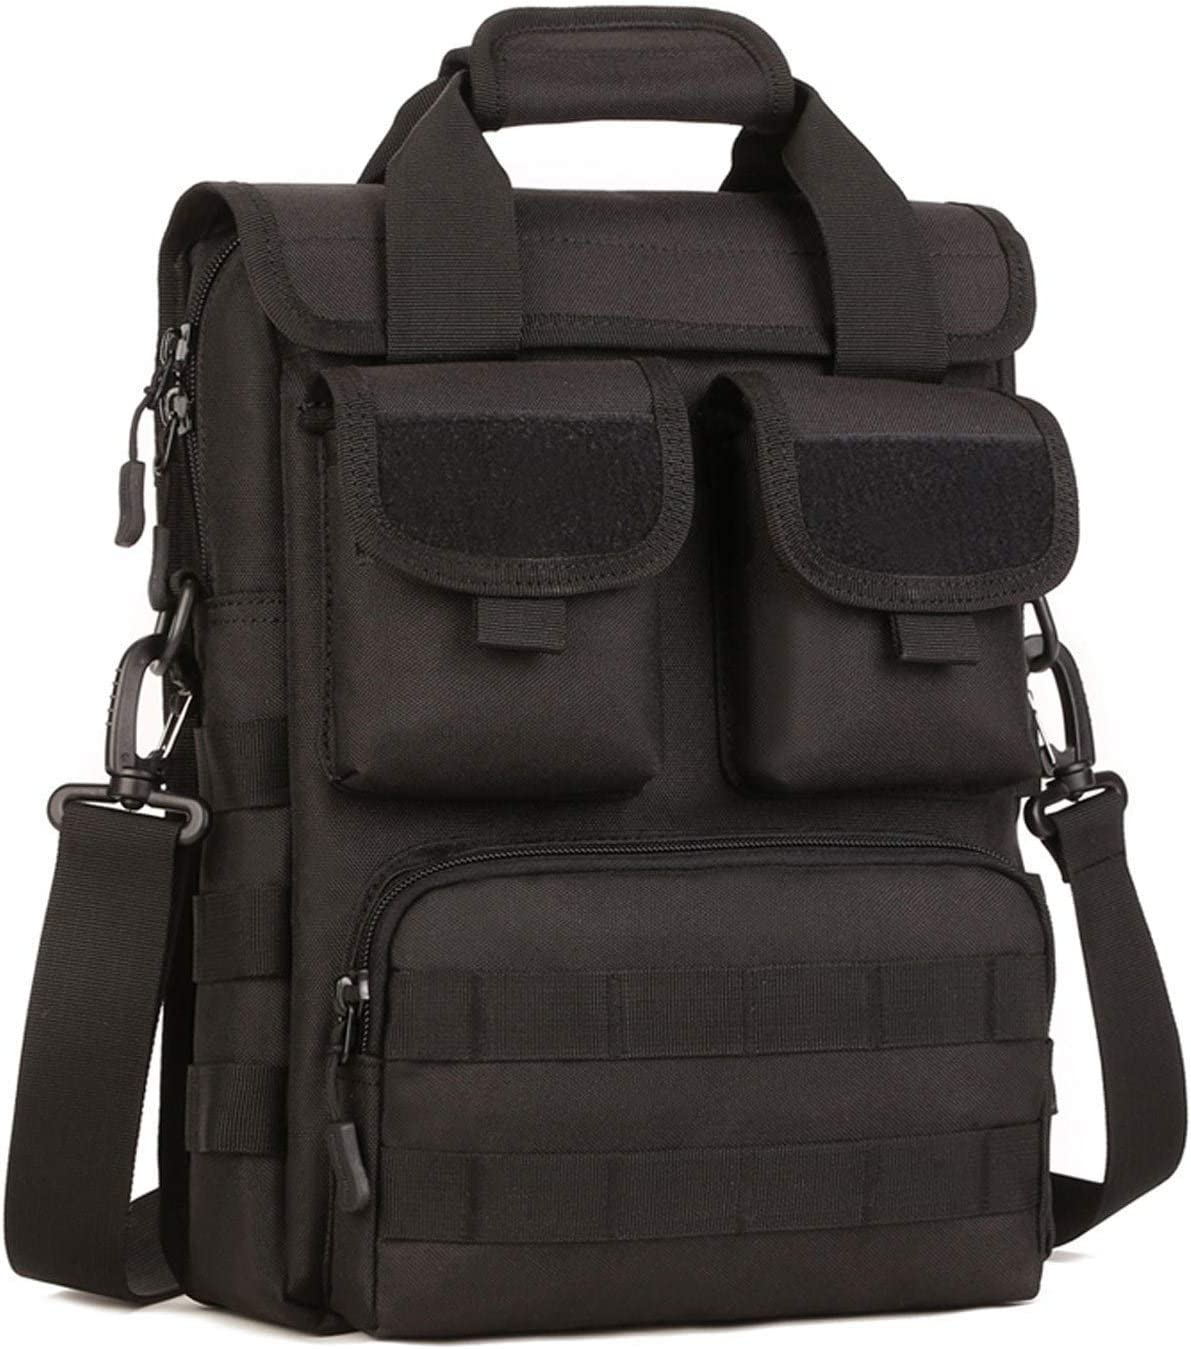 CamGo Tactical Briefcase Small Military 12 inch Laptop Messenger Bag Computer Shoulder Bag (Black)